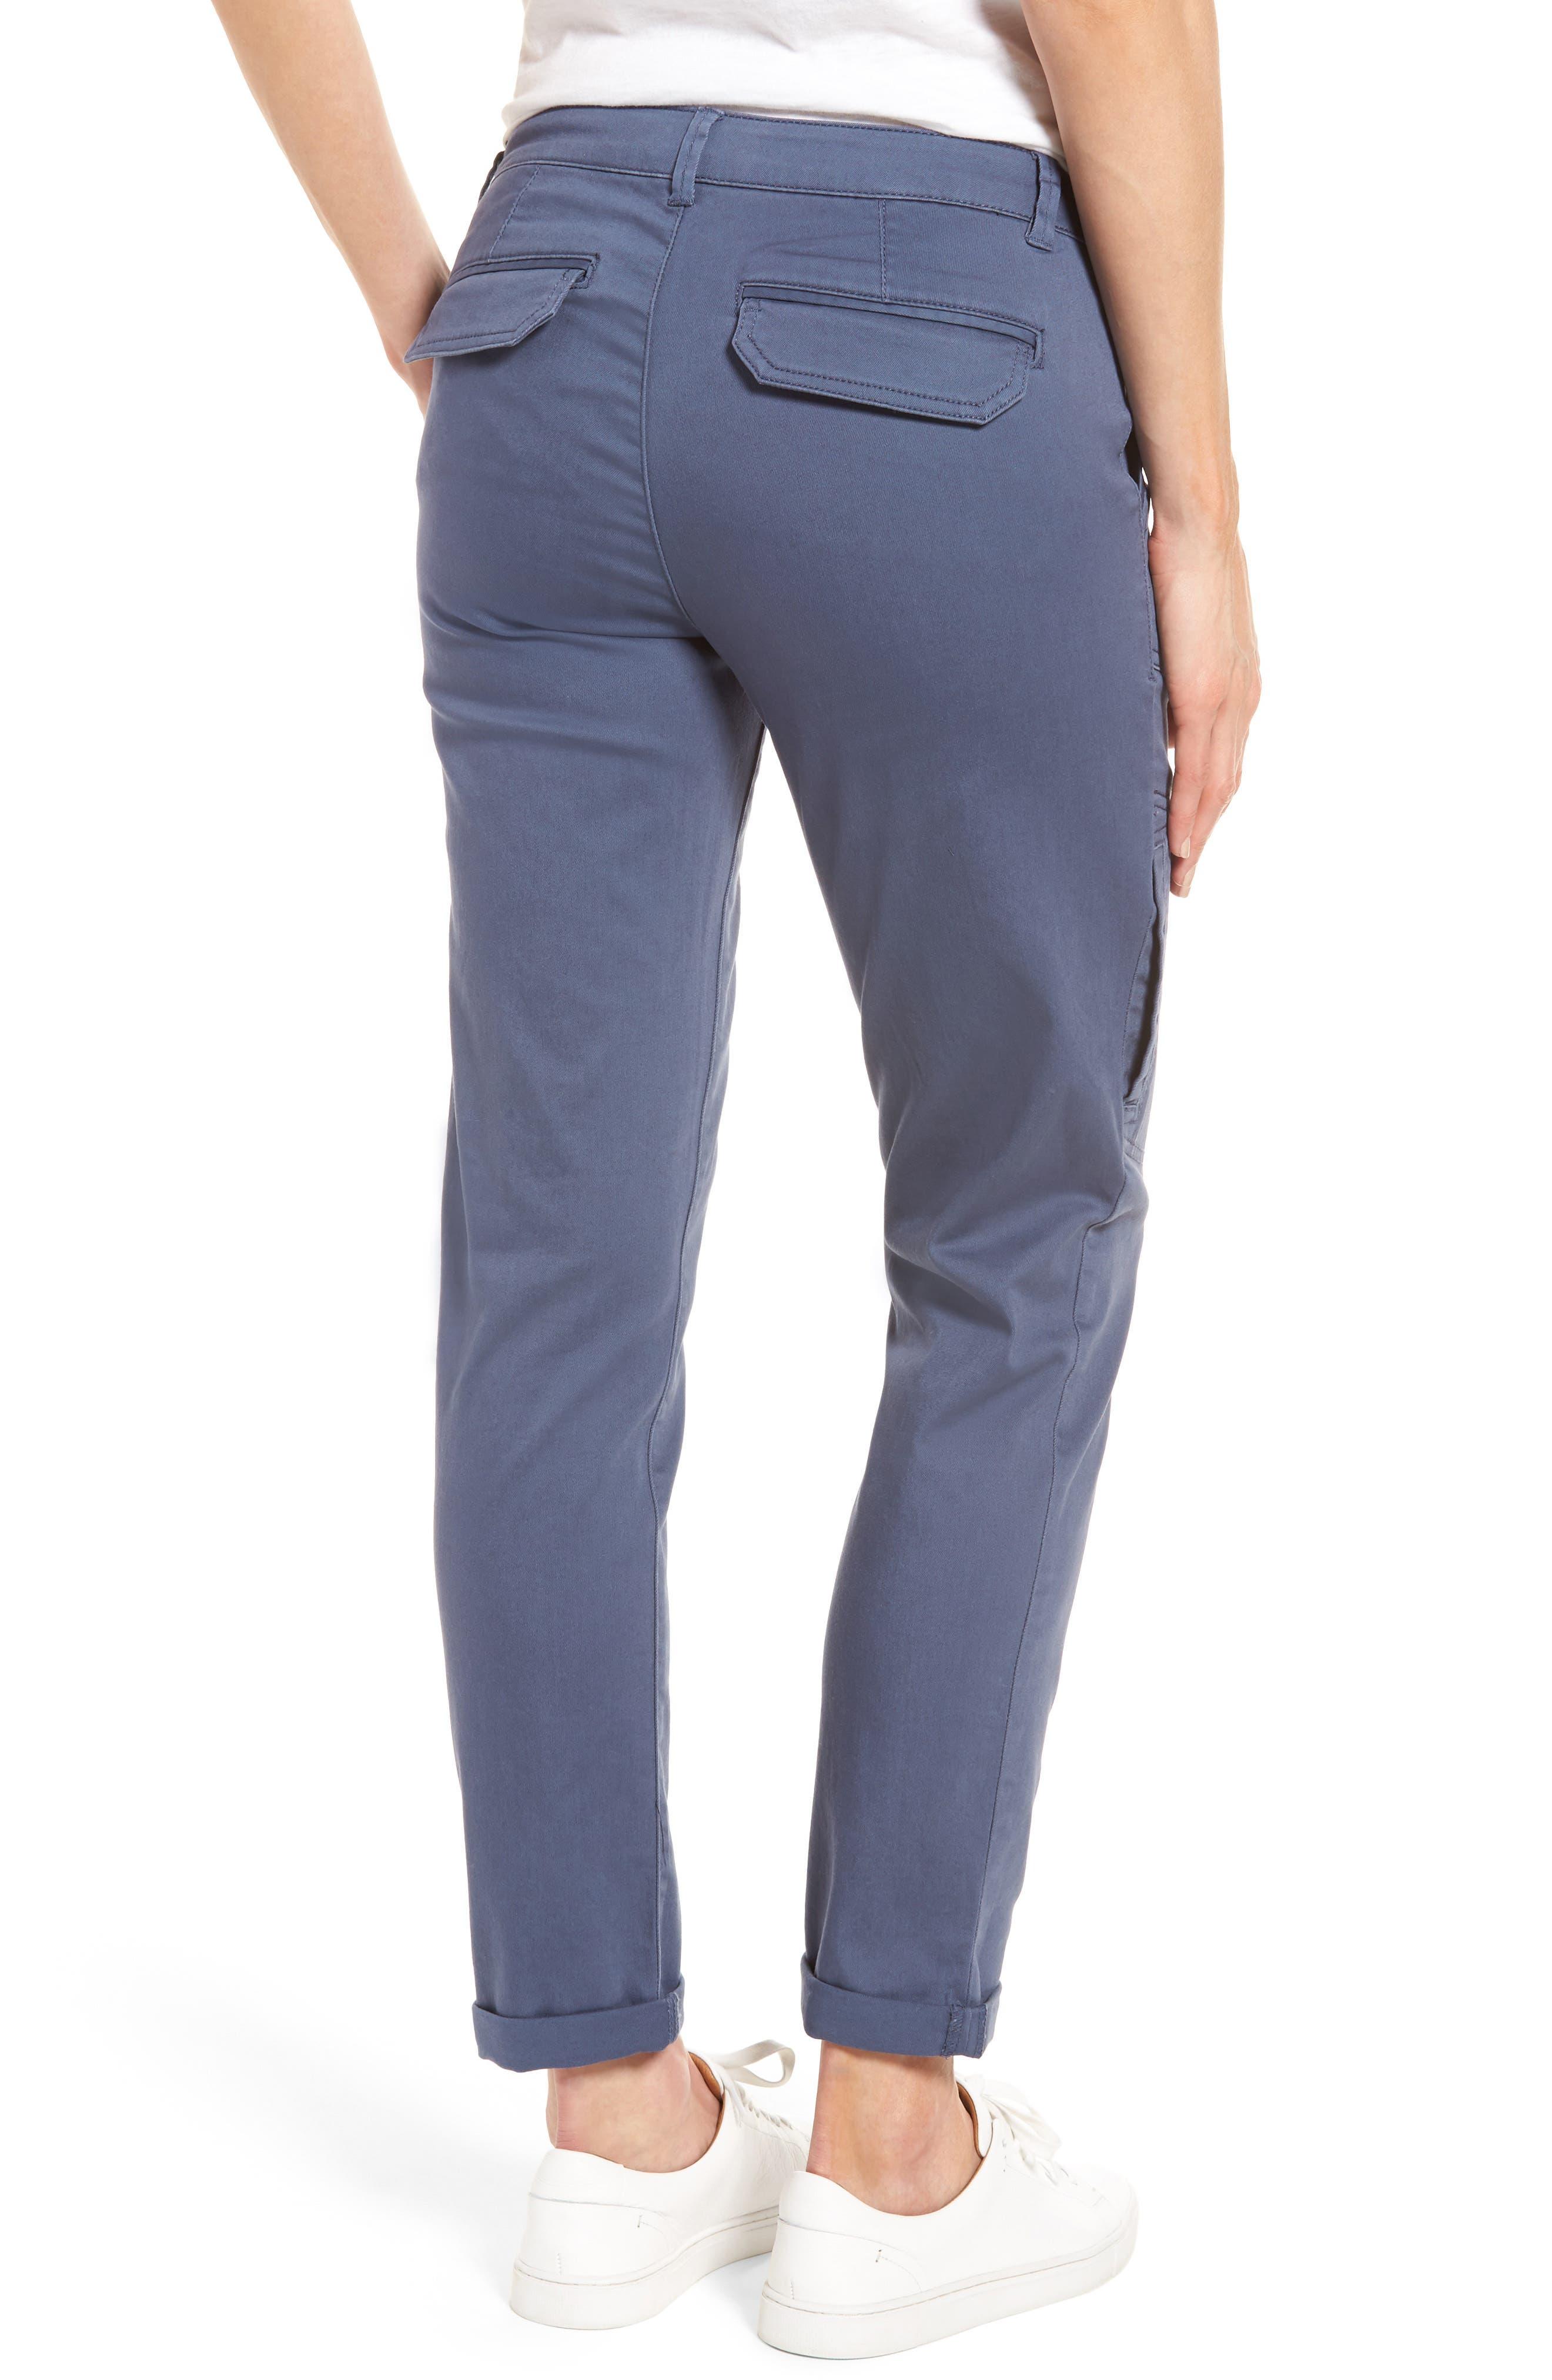 Alternate Image 2  - Wit & Wisdom Skinny Cargo Pants (Regular & Petite) (Nordstrom Exclusive)